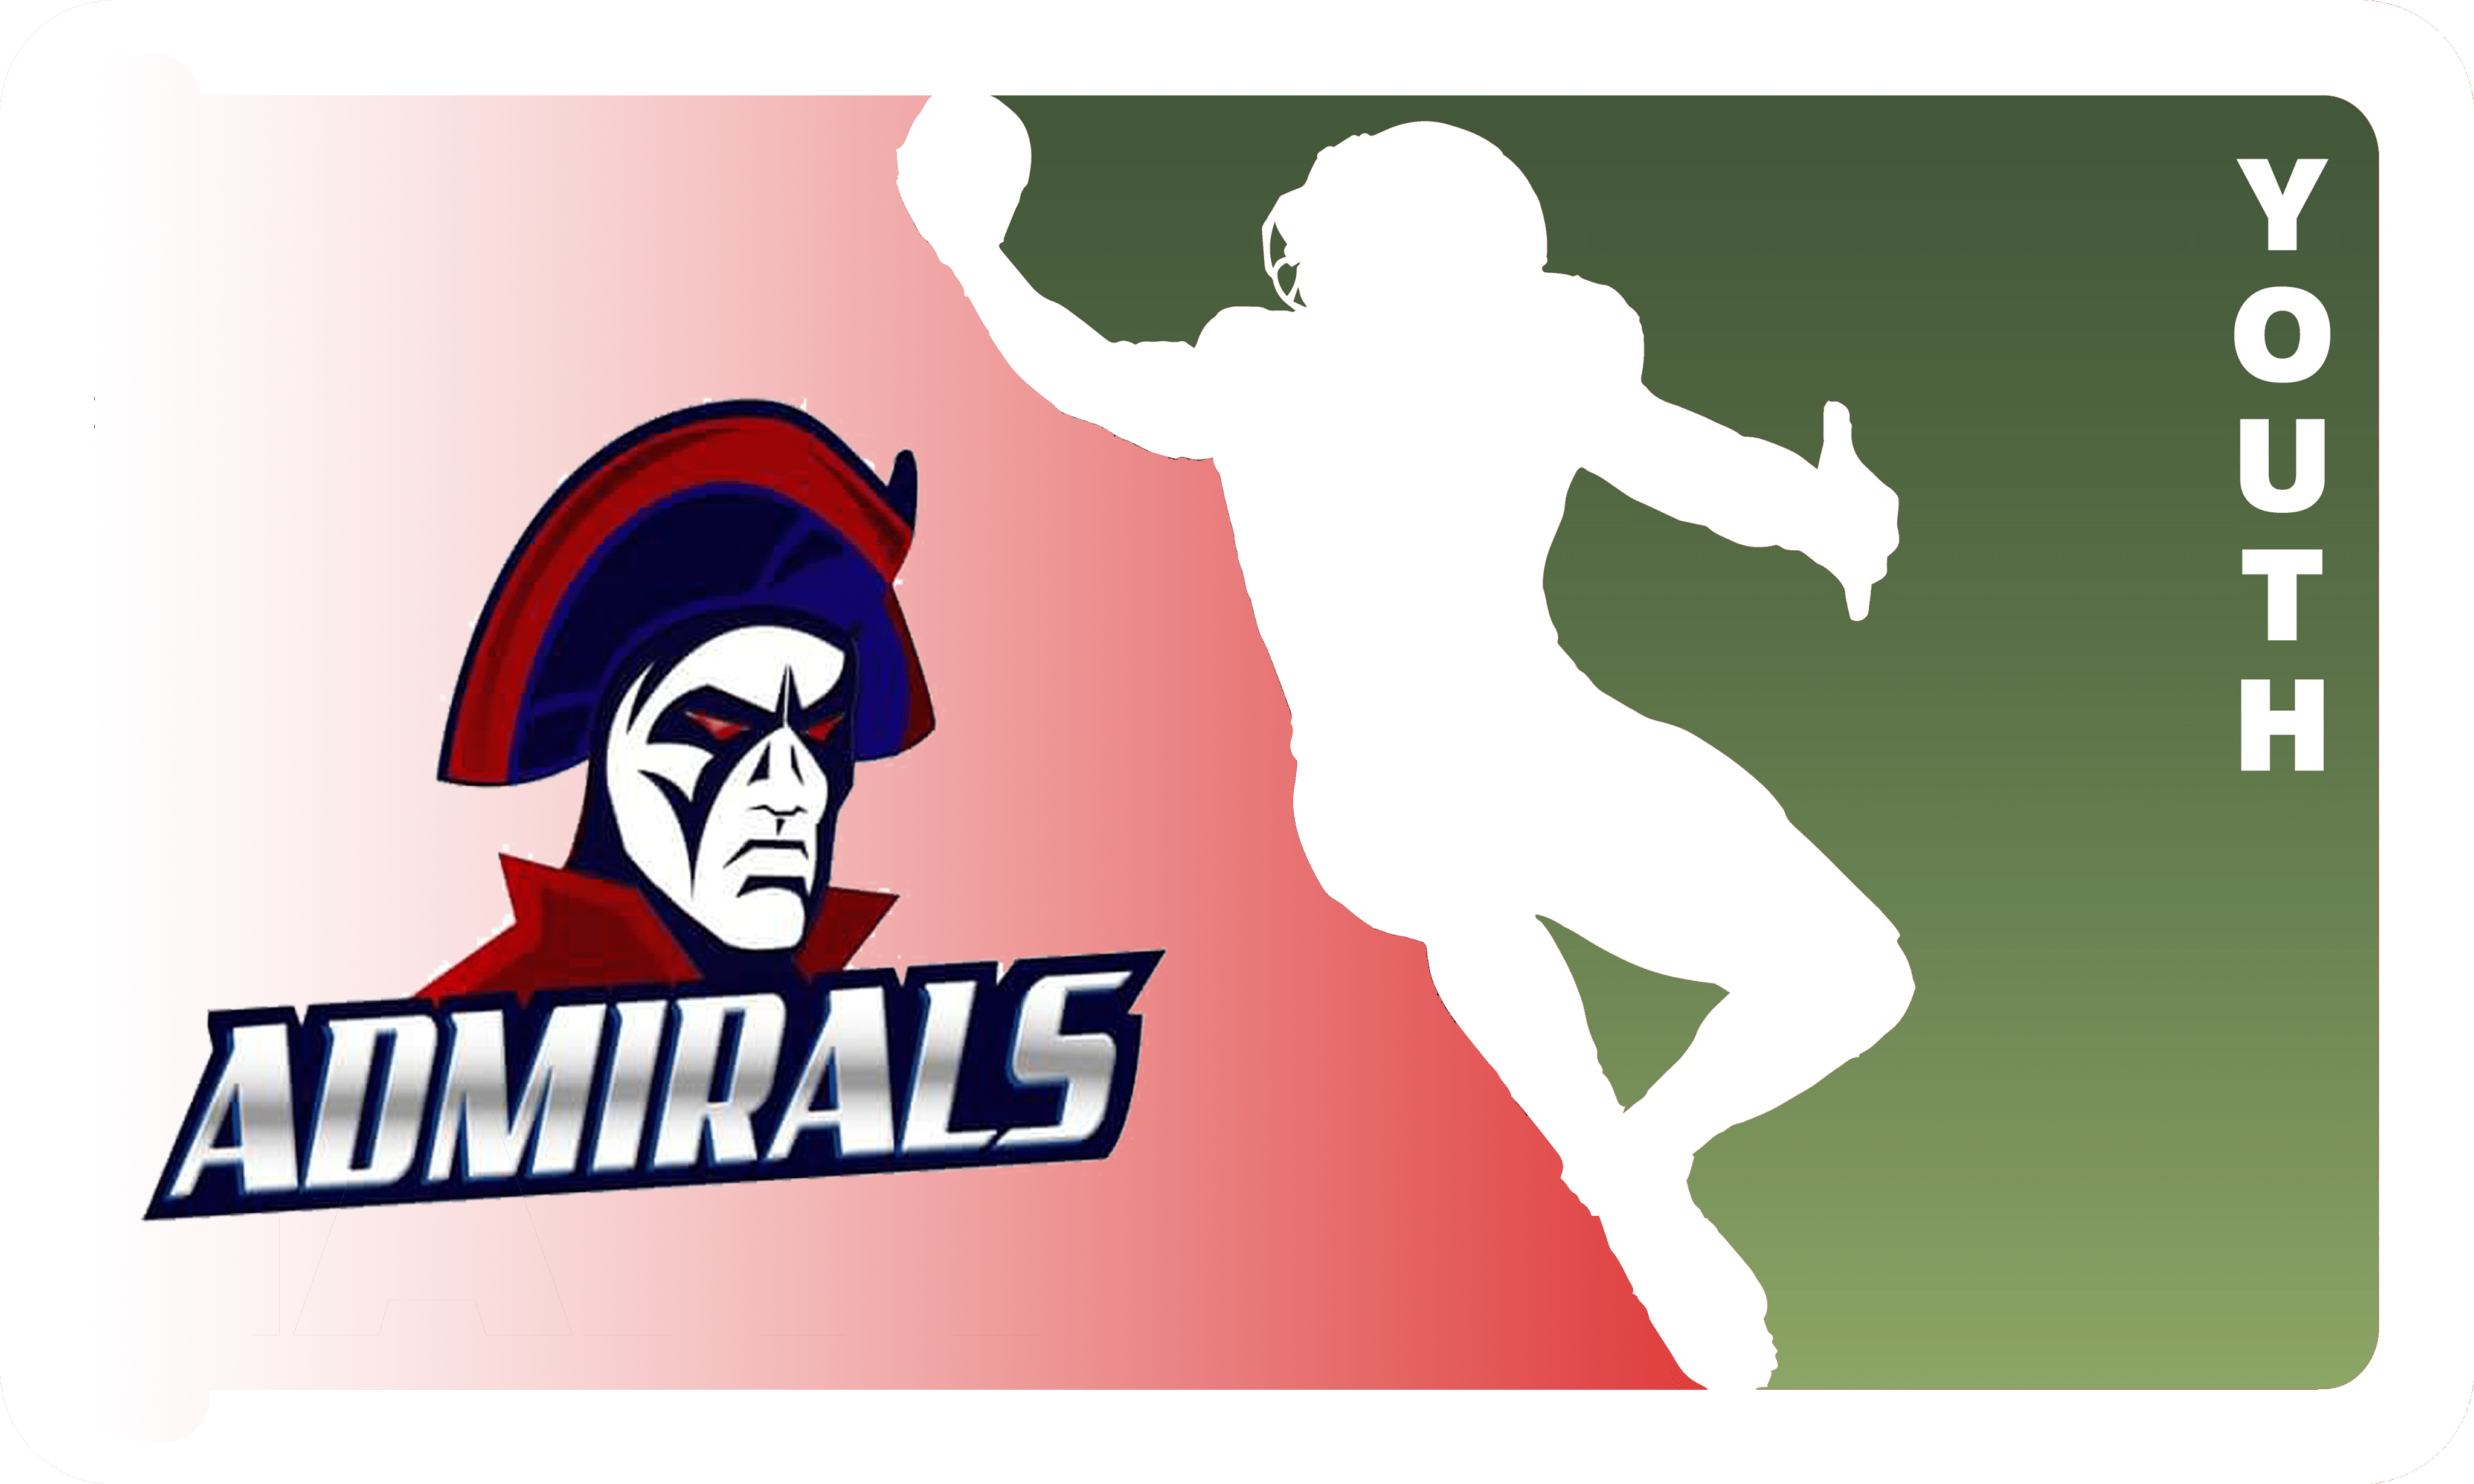 Youth League 2019: Cork Admirals